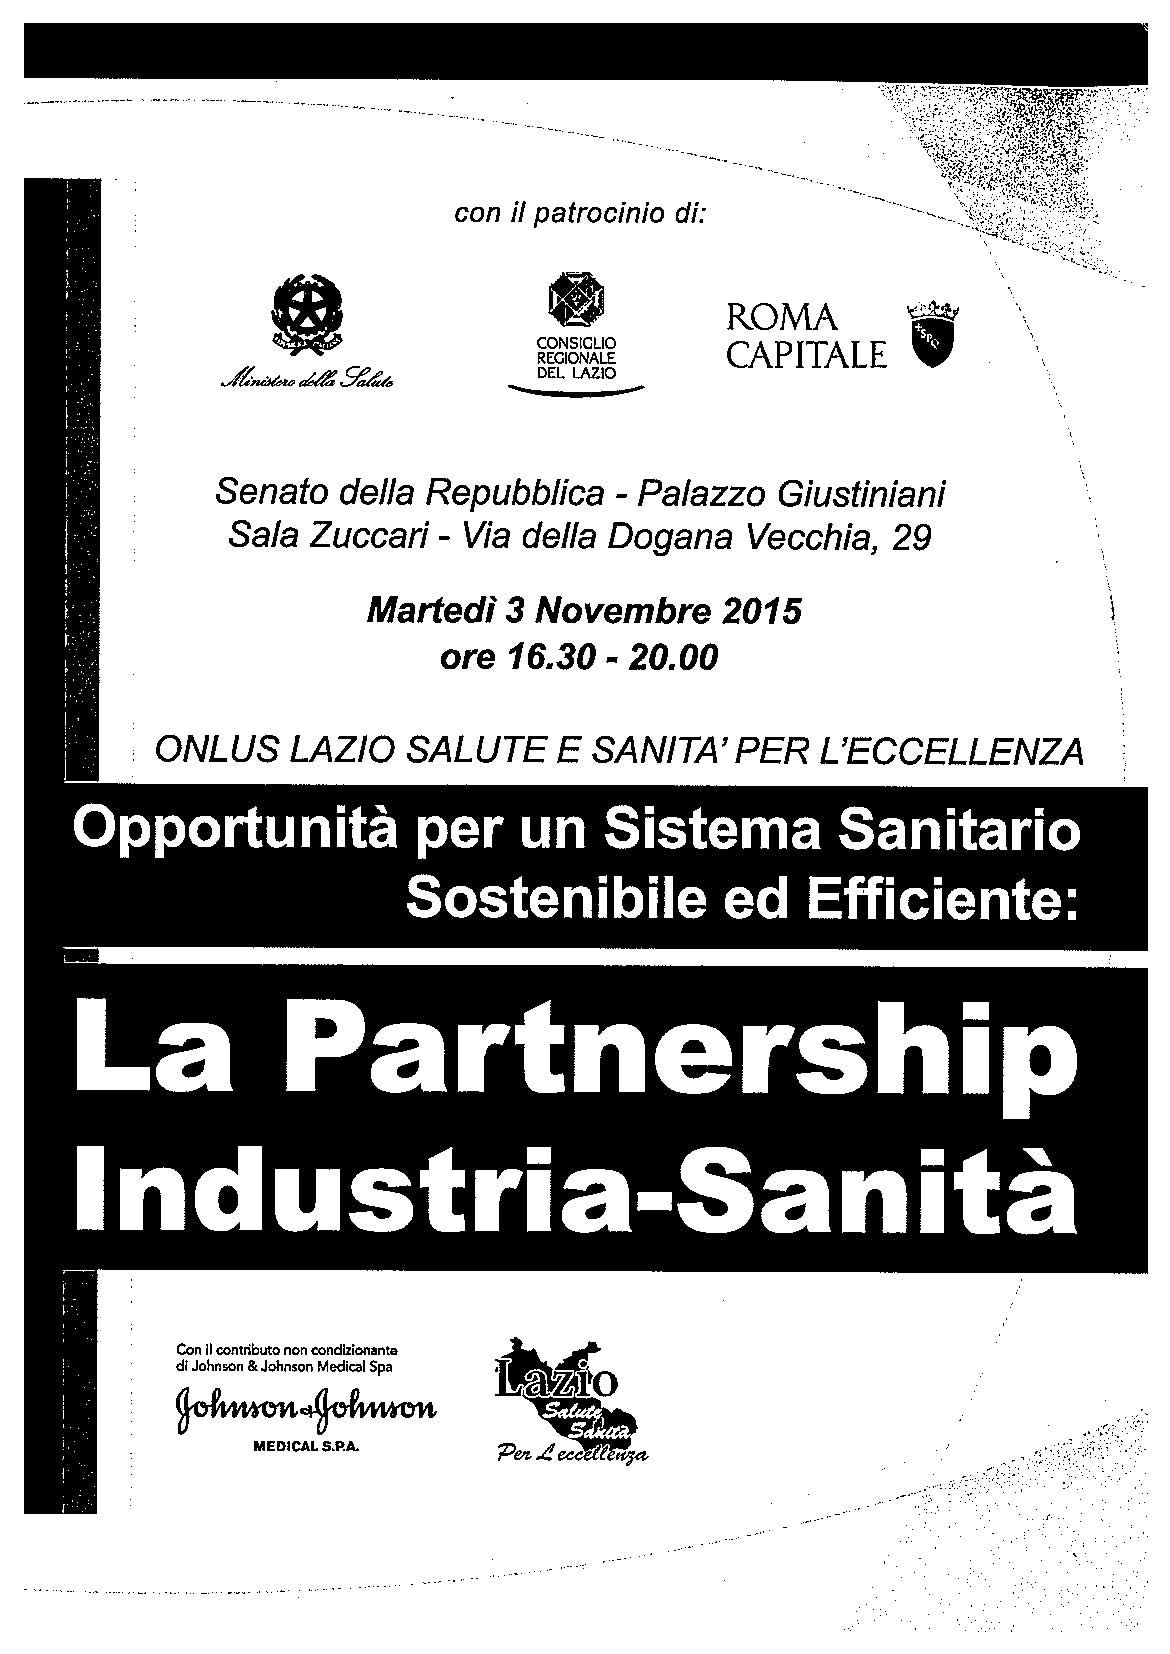 Locandina - La partnership industria-sanità